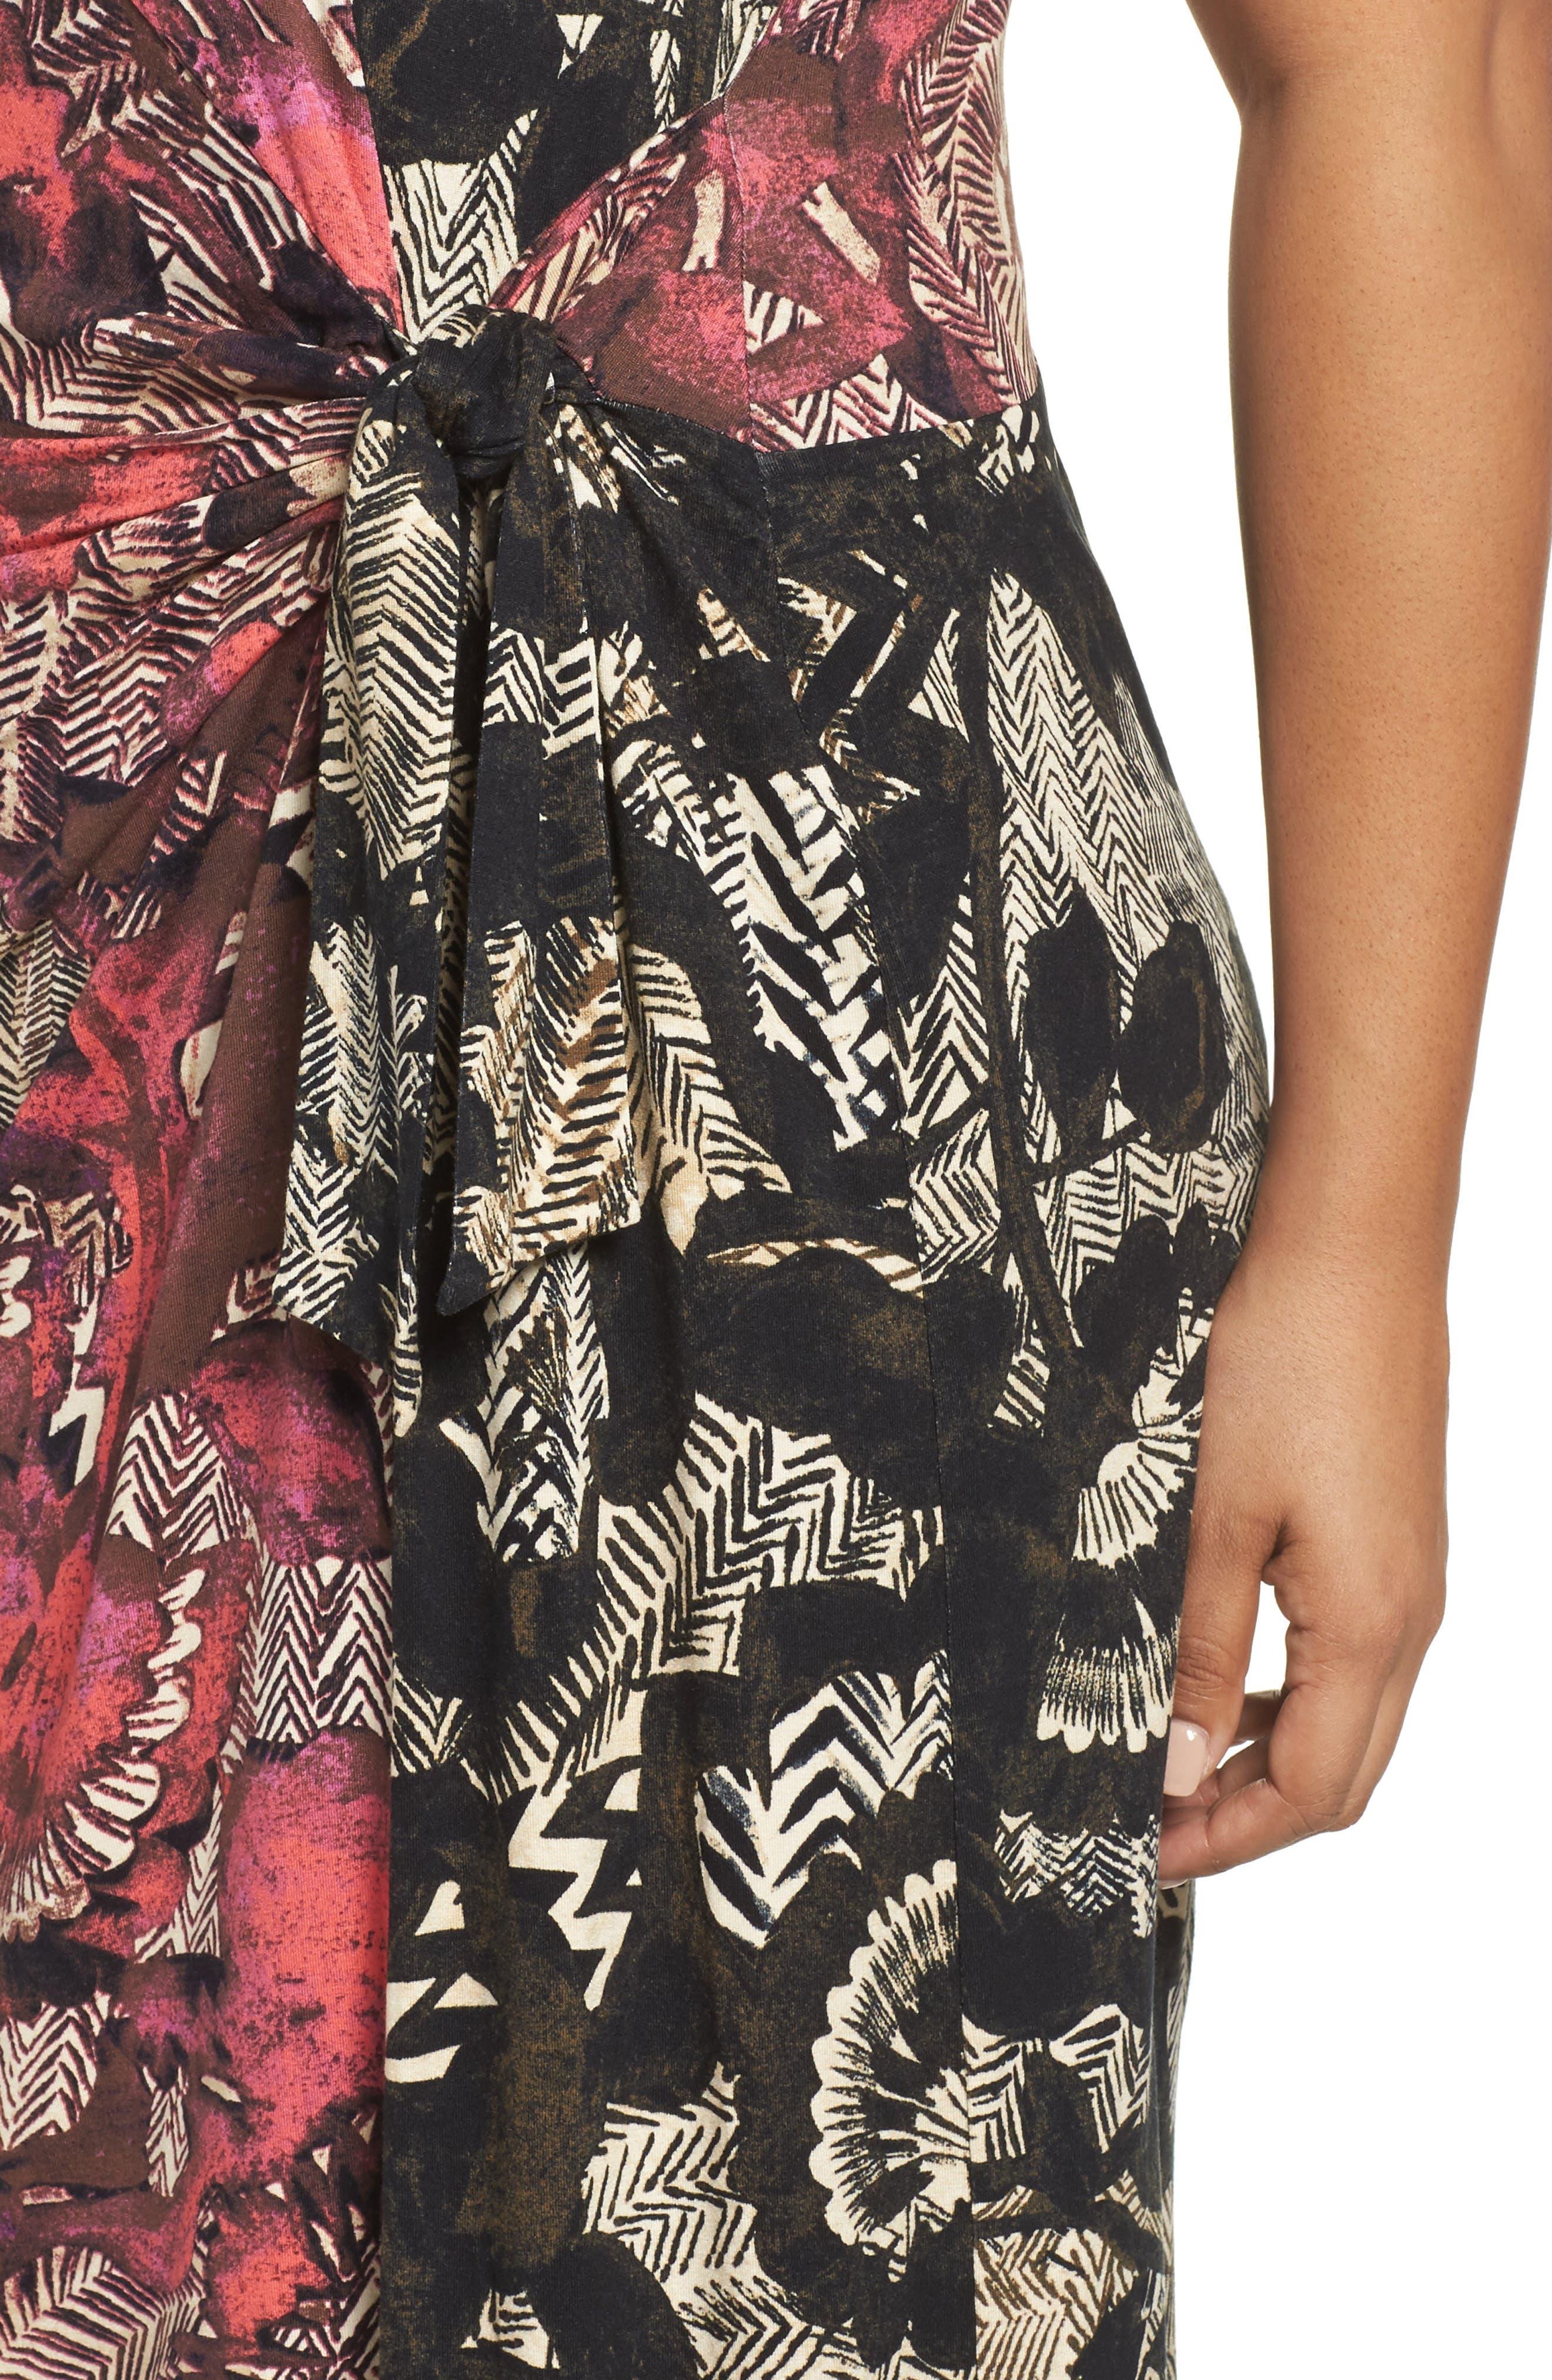 Etched Floral Dress,                             Alternate thumbnail 4, color,                             Multi